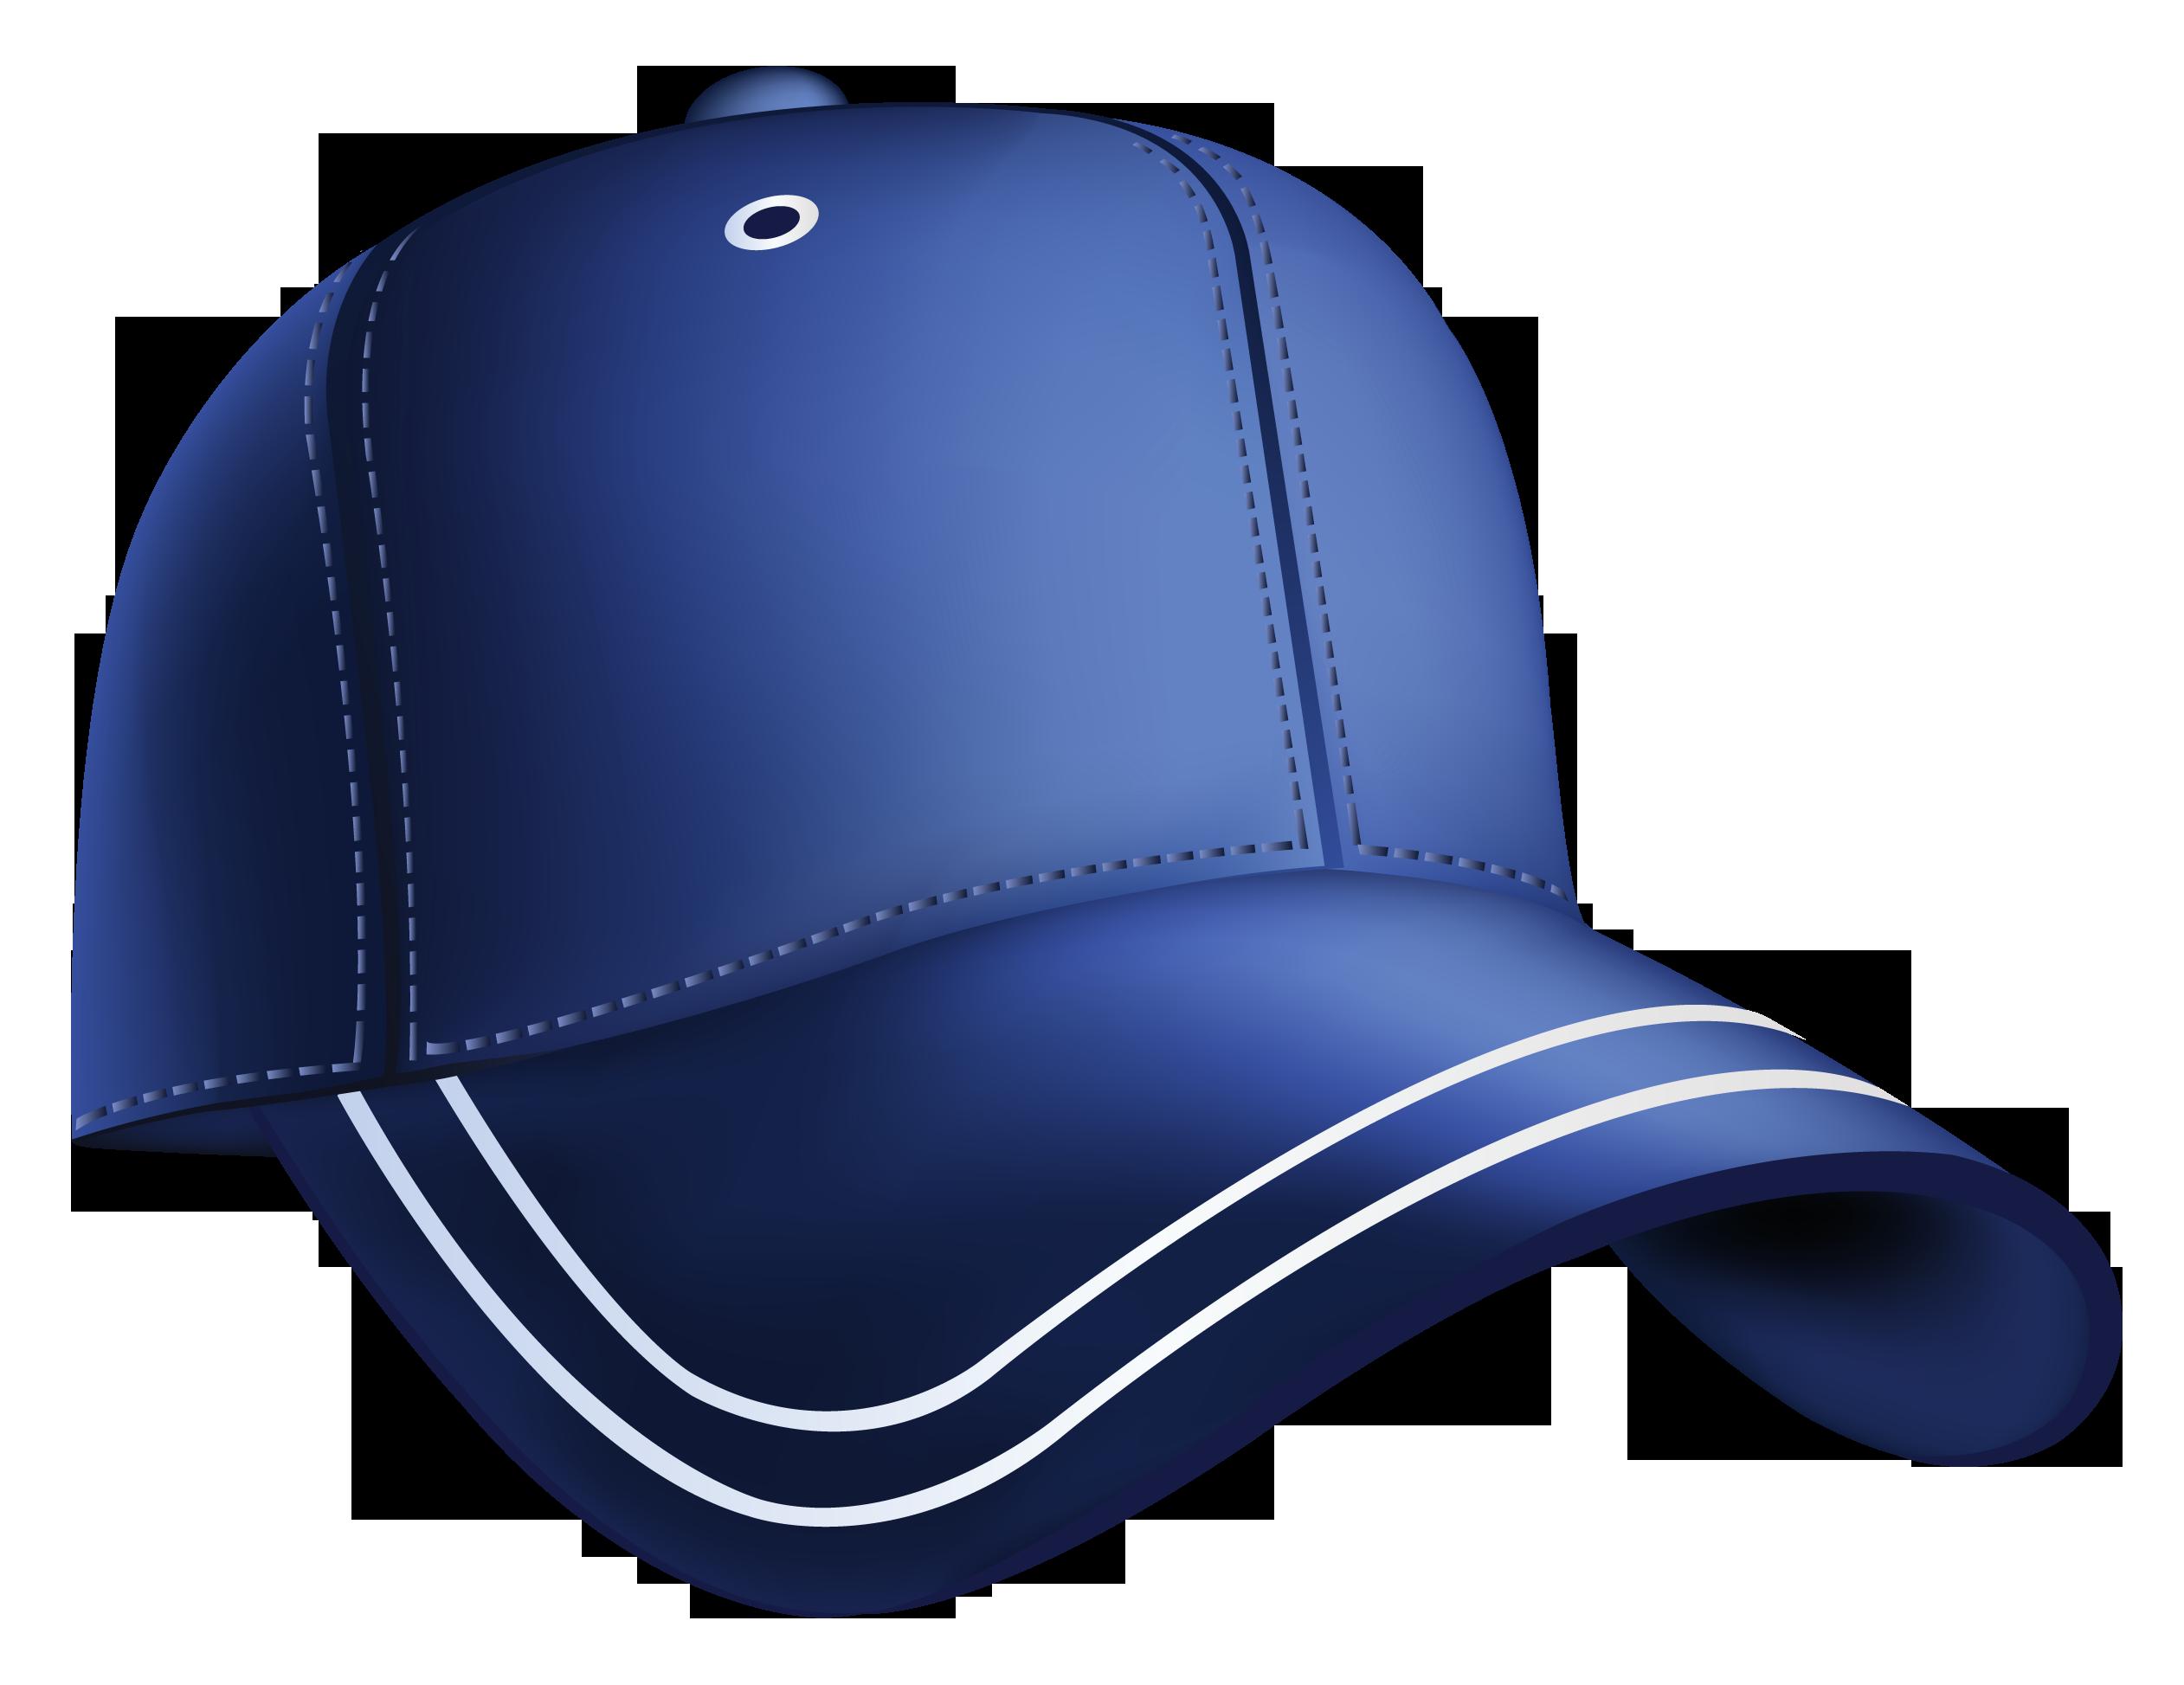 Baseball Hat Clip Art Clipart - Baseball Cap Clip Art